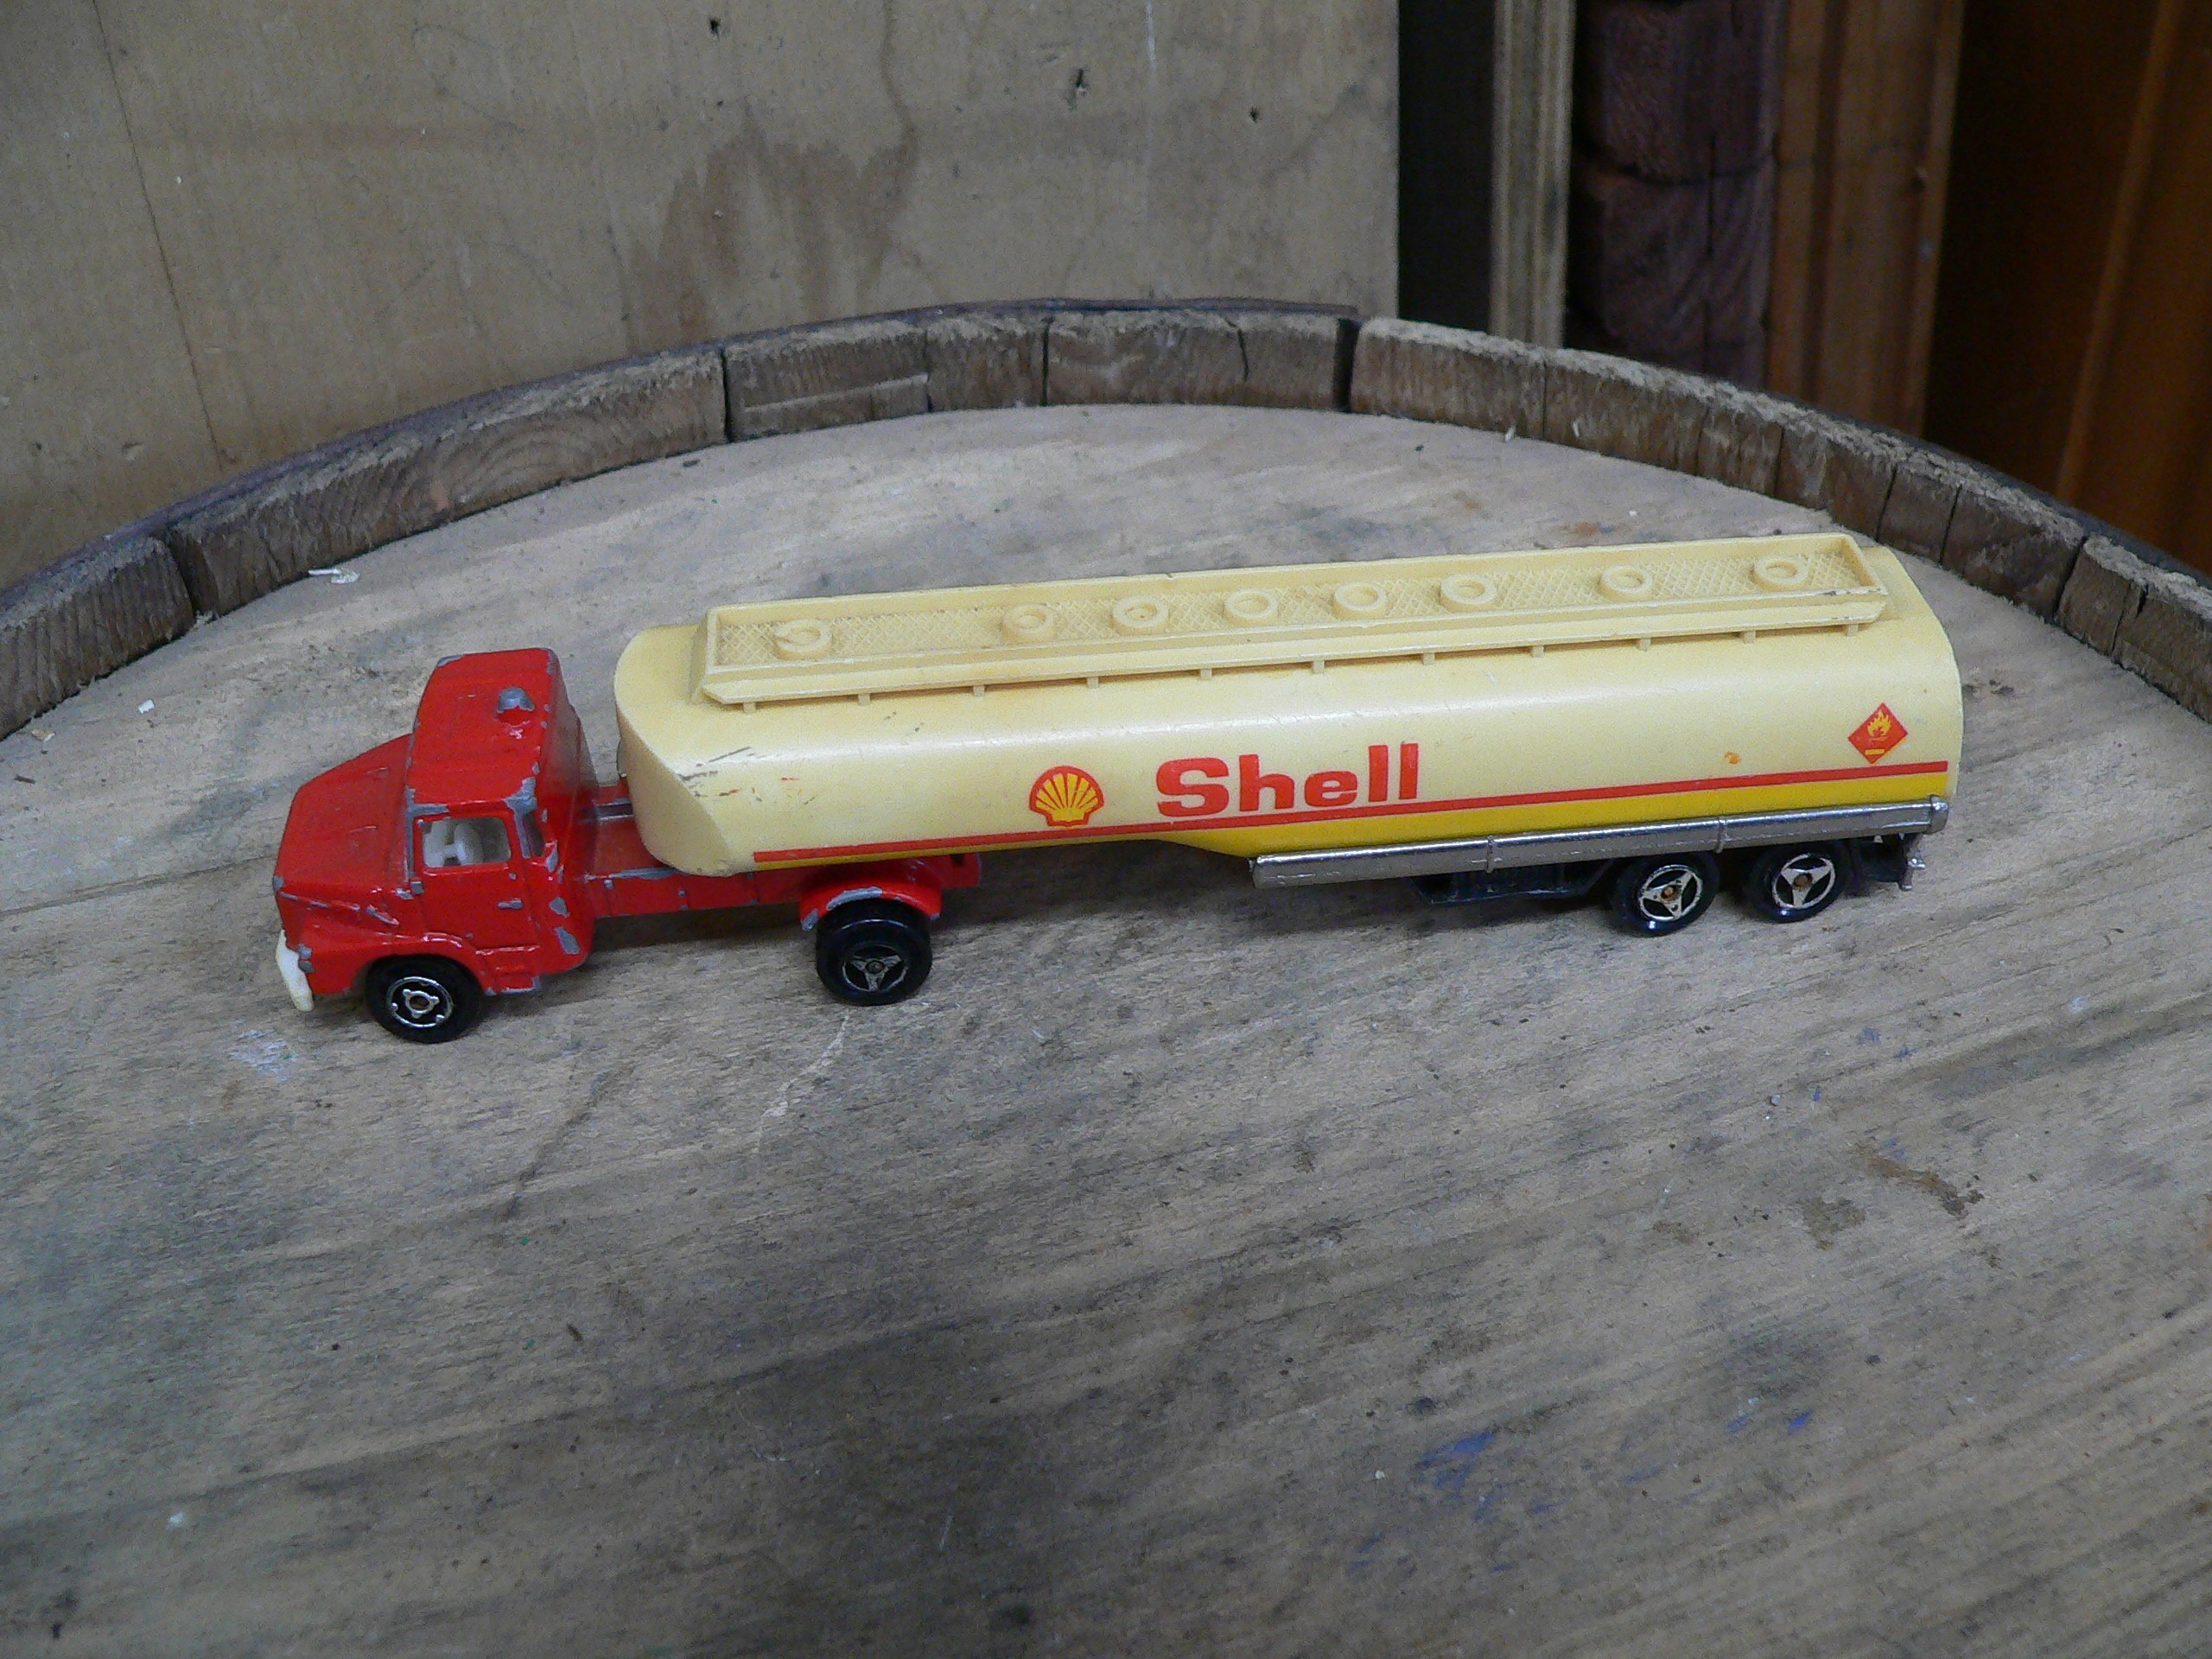 Camion remorque shell # 5446.35